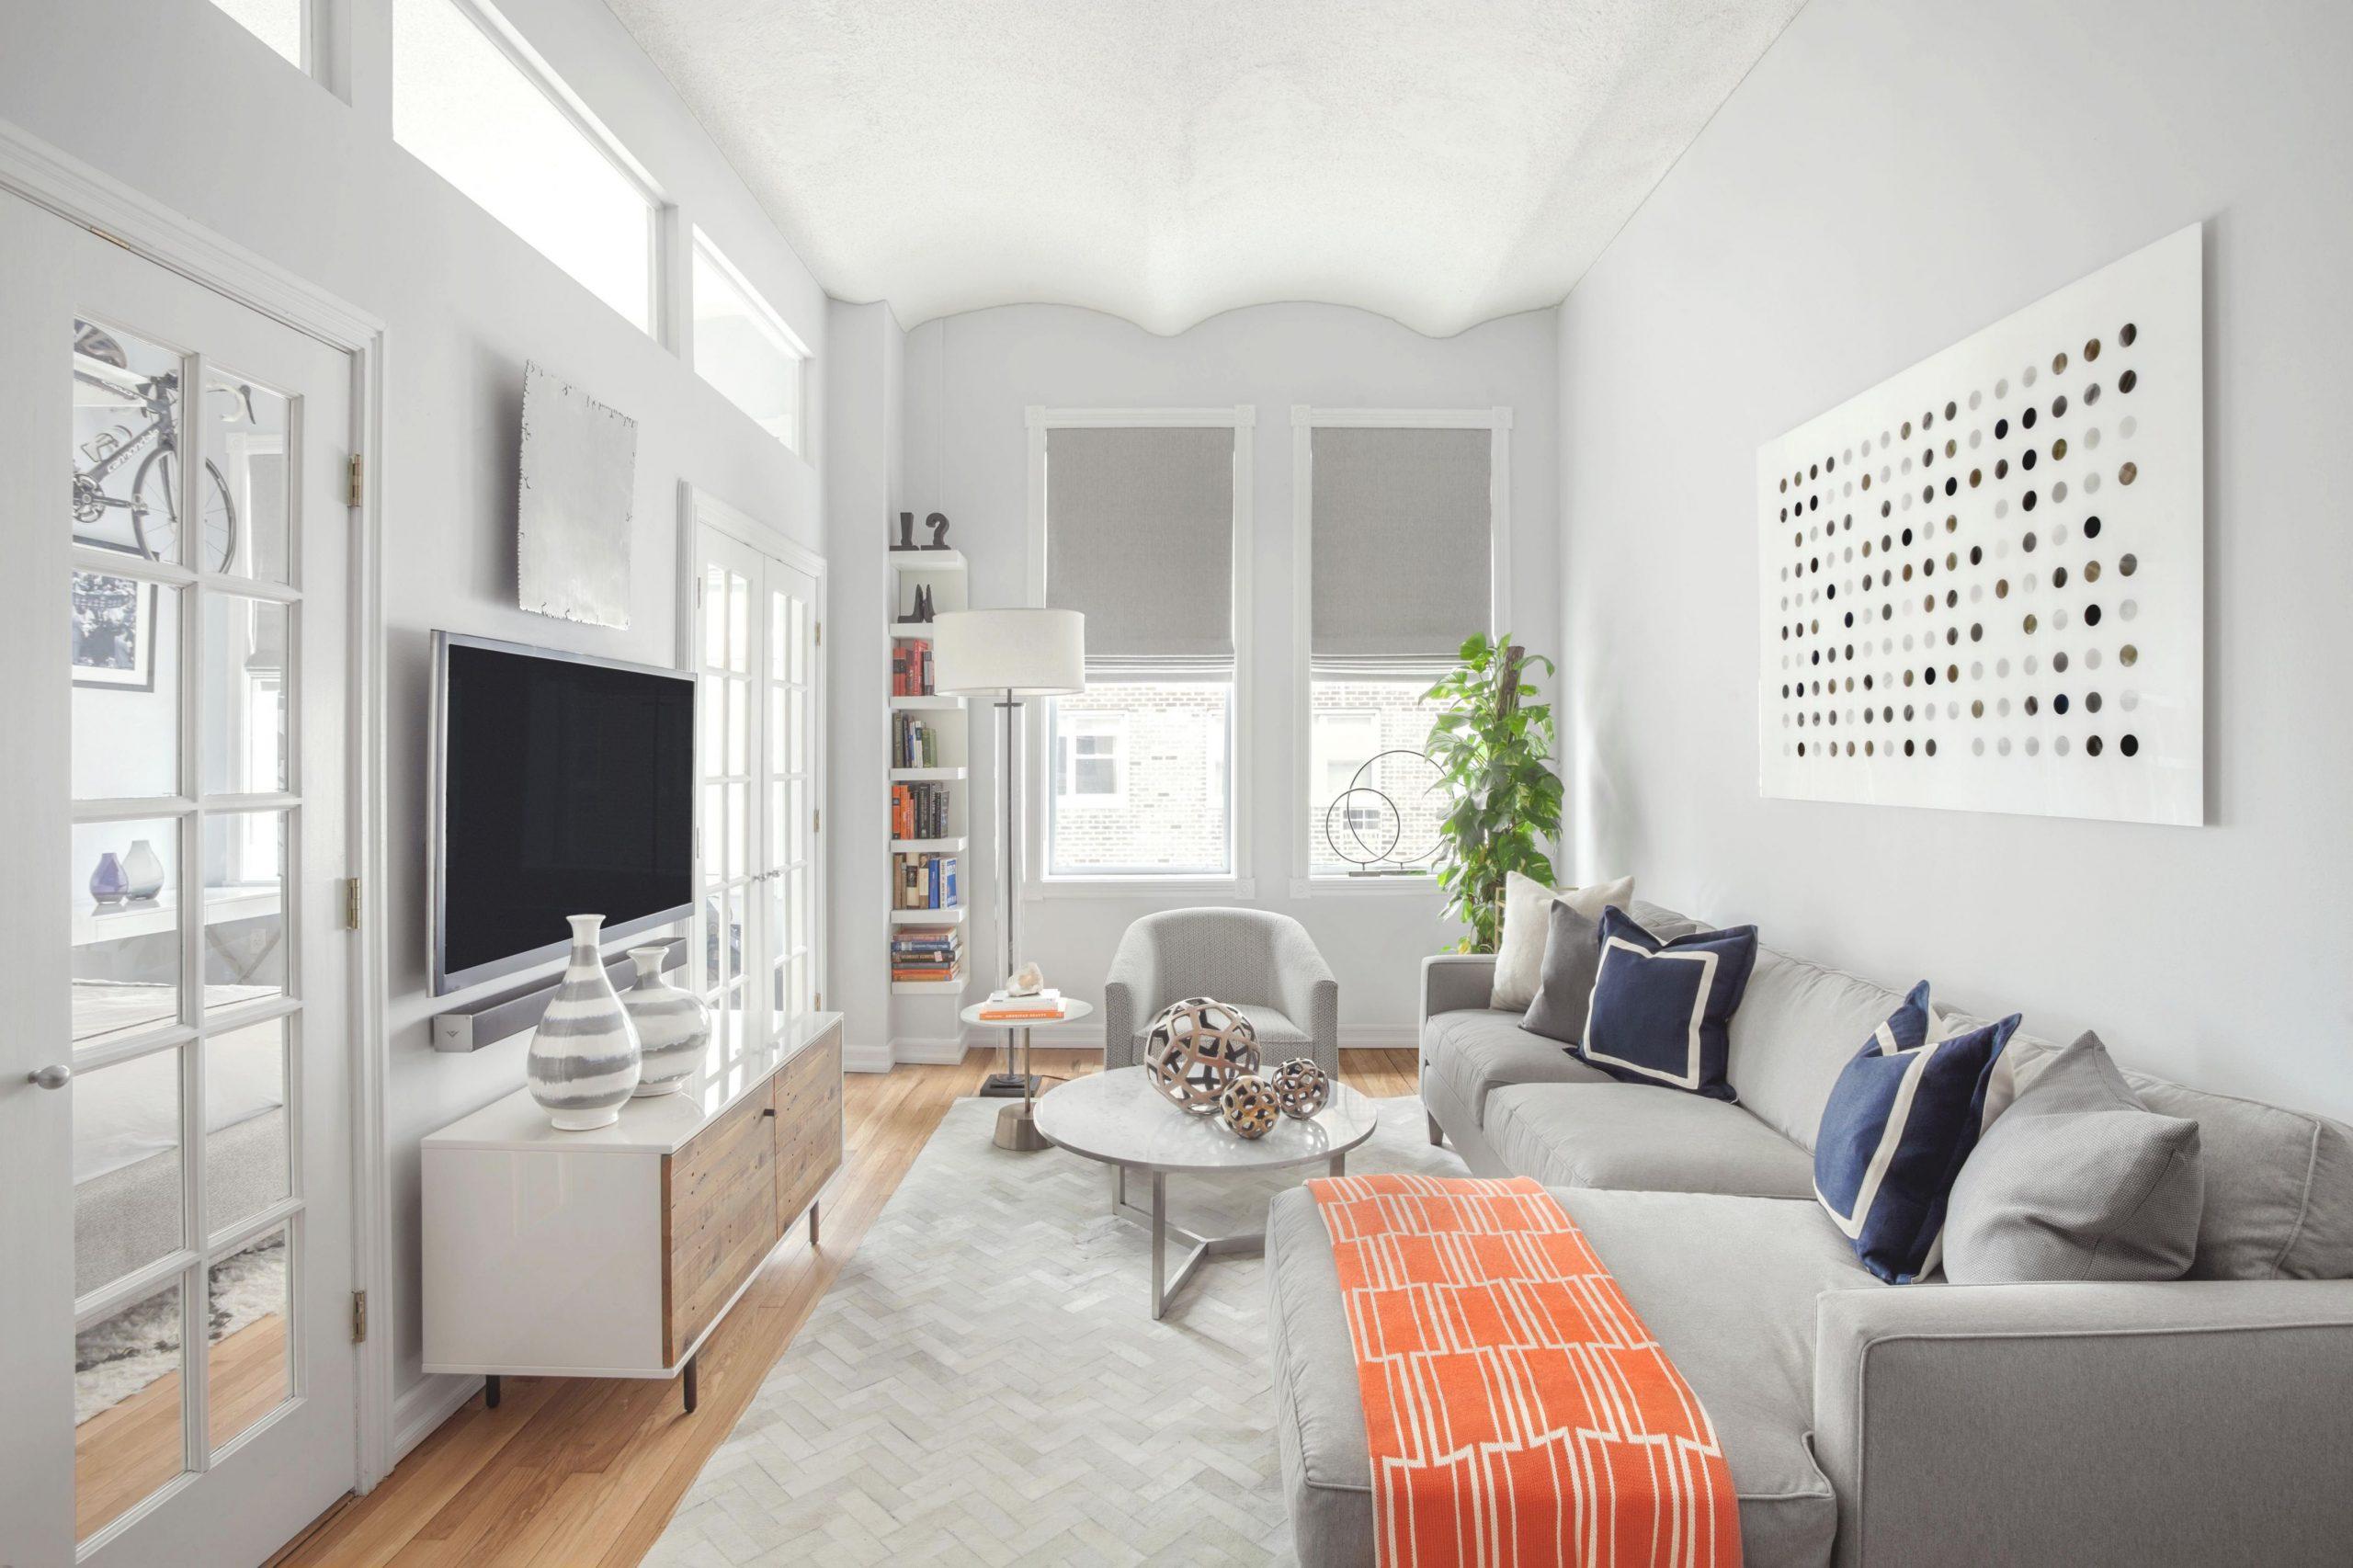 Living Room Decorate Apartment Interior Design Ideas Cozy inside The Best Ideas for Apartment Living Room Design Ideas